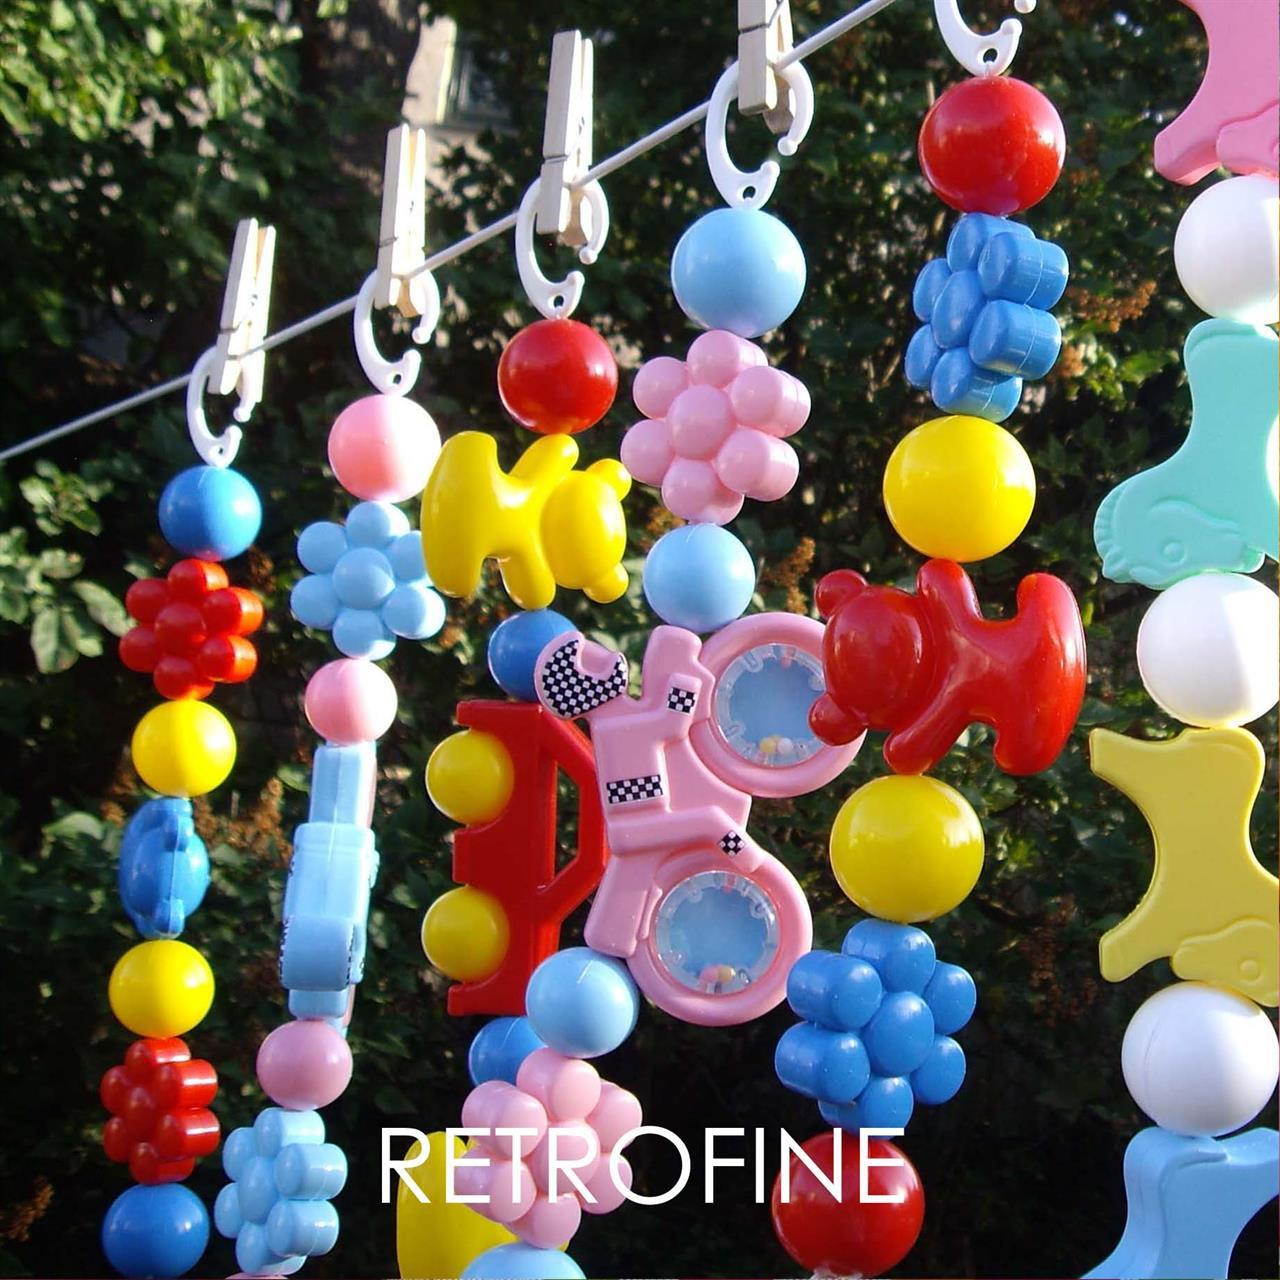 Retrofine